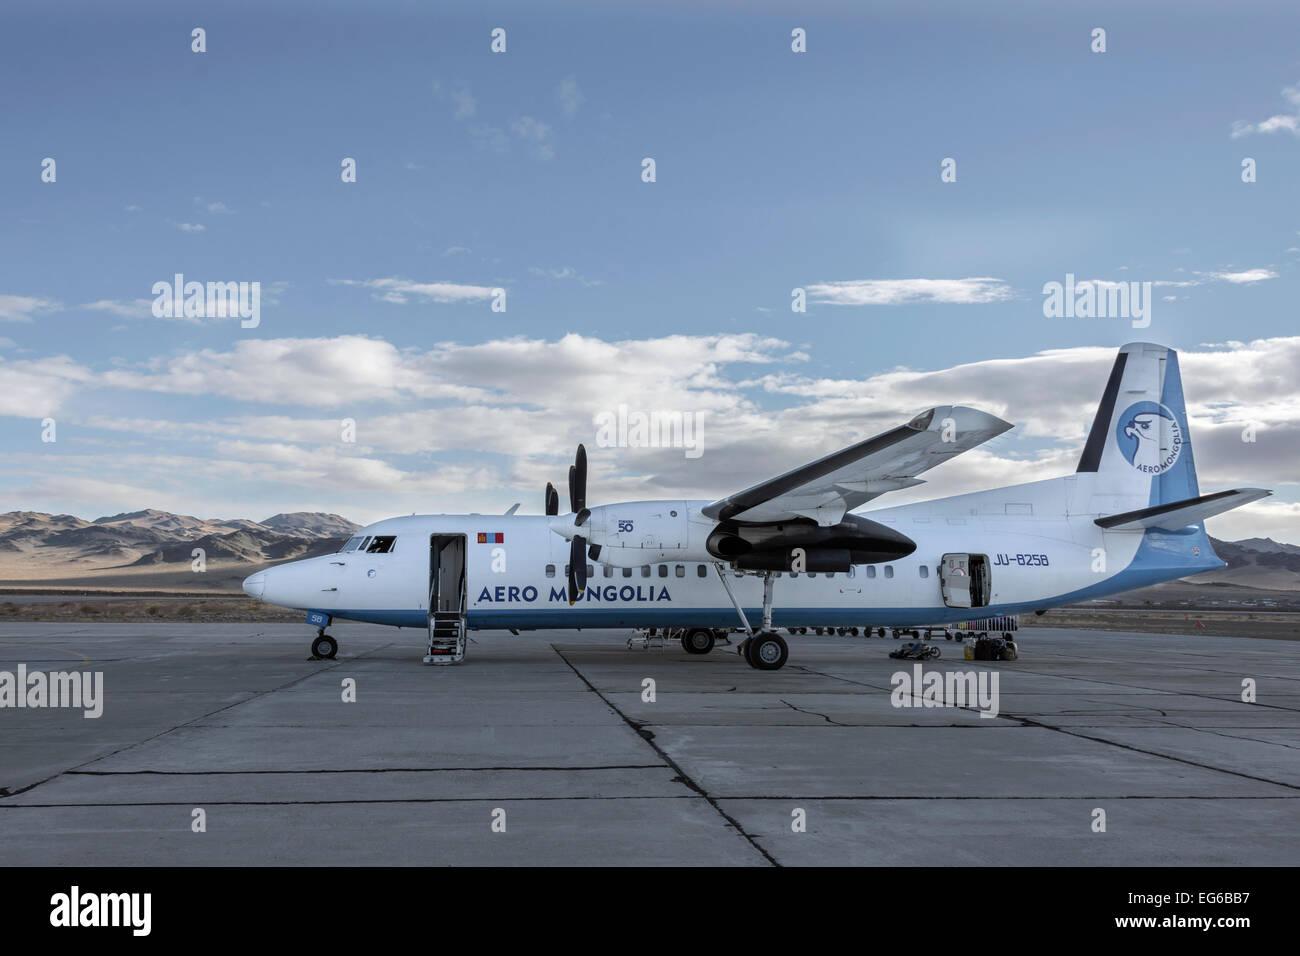 Aero Mongolia prop plane at Olgii Airport, Western Mongolia Stock Photo